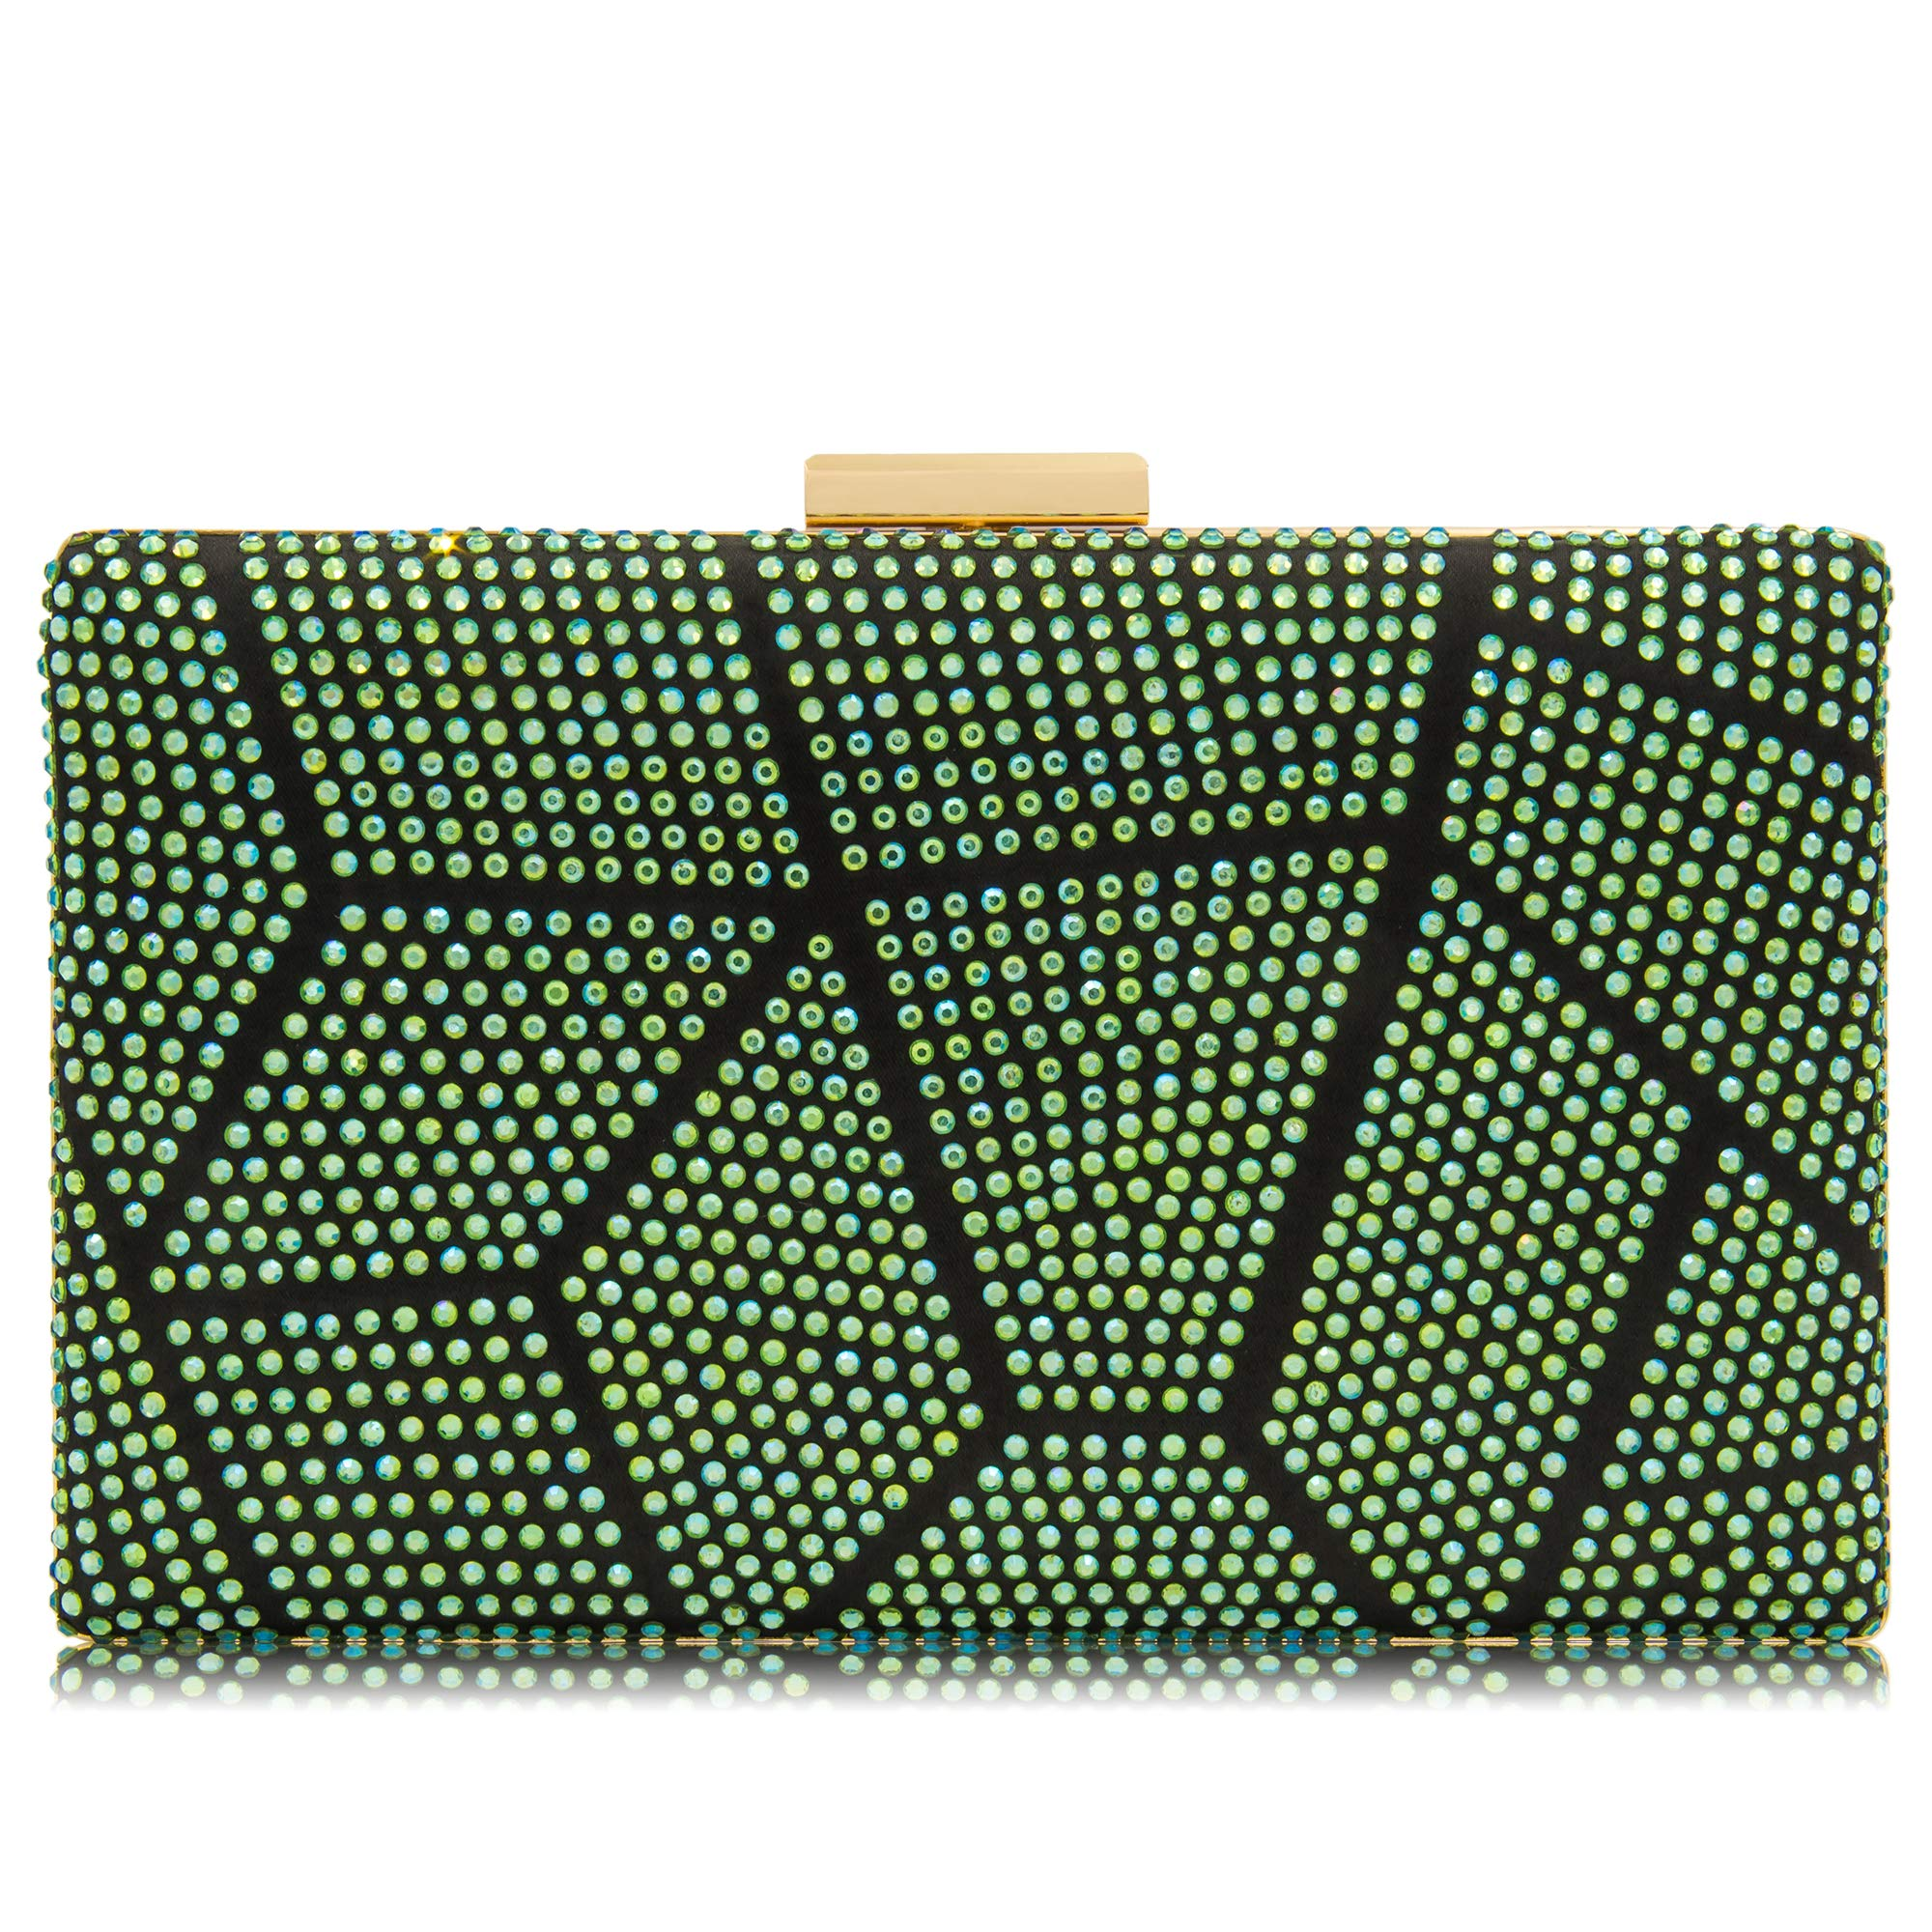 Women Clutches Crystal Evening Bags Clutch Purse Party Wedding Handbags (AB Green)